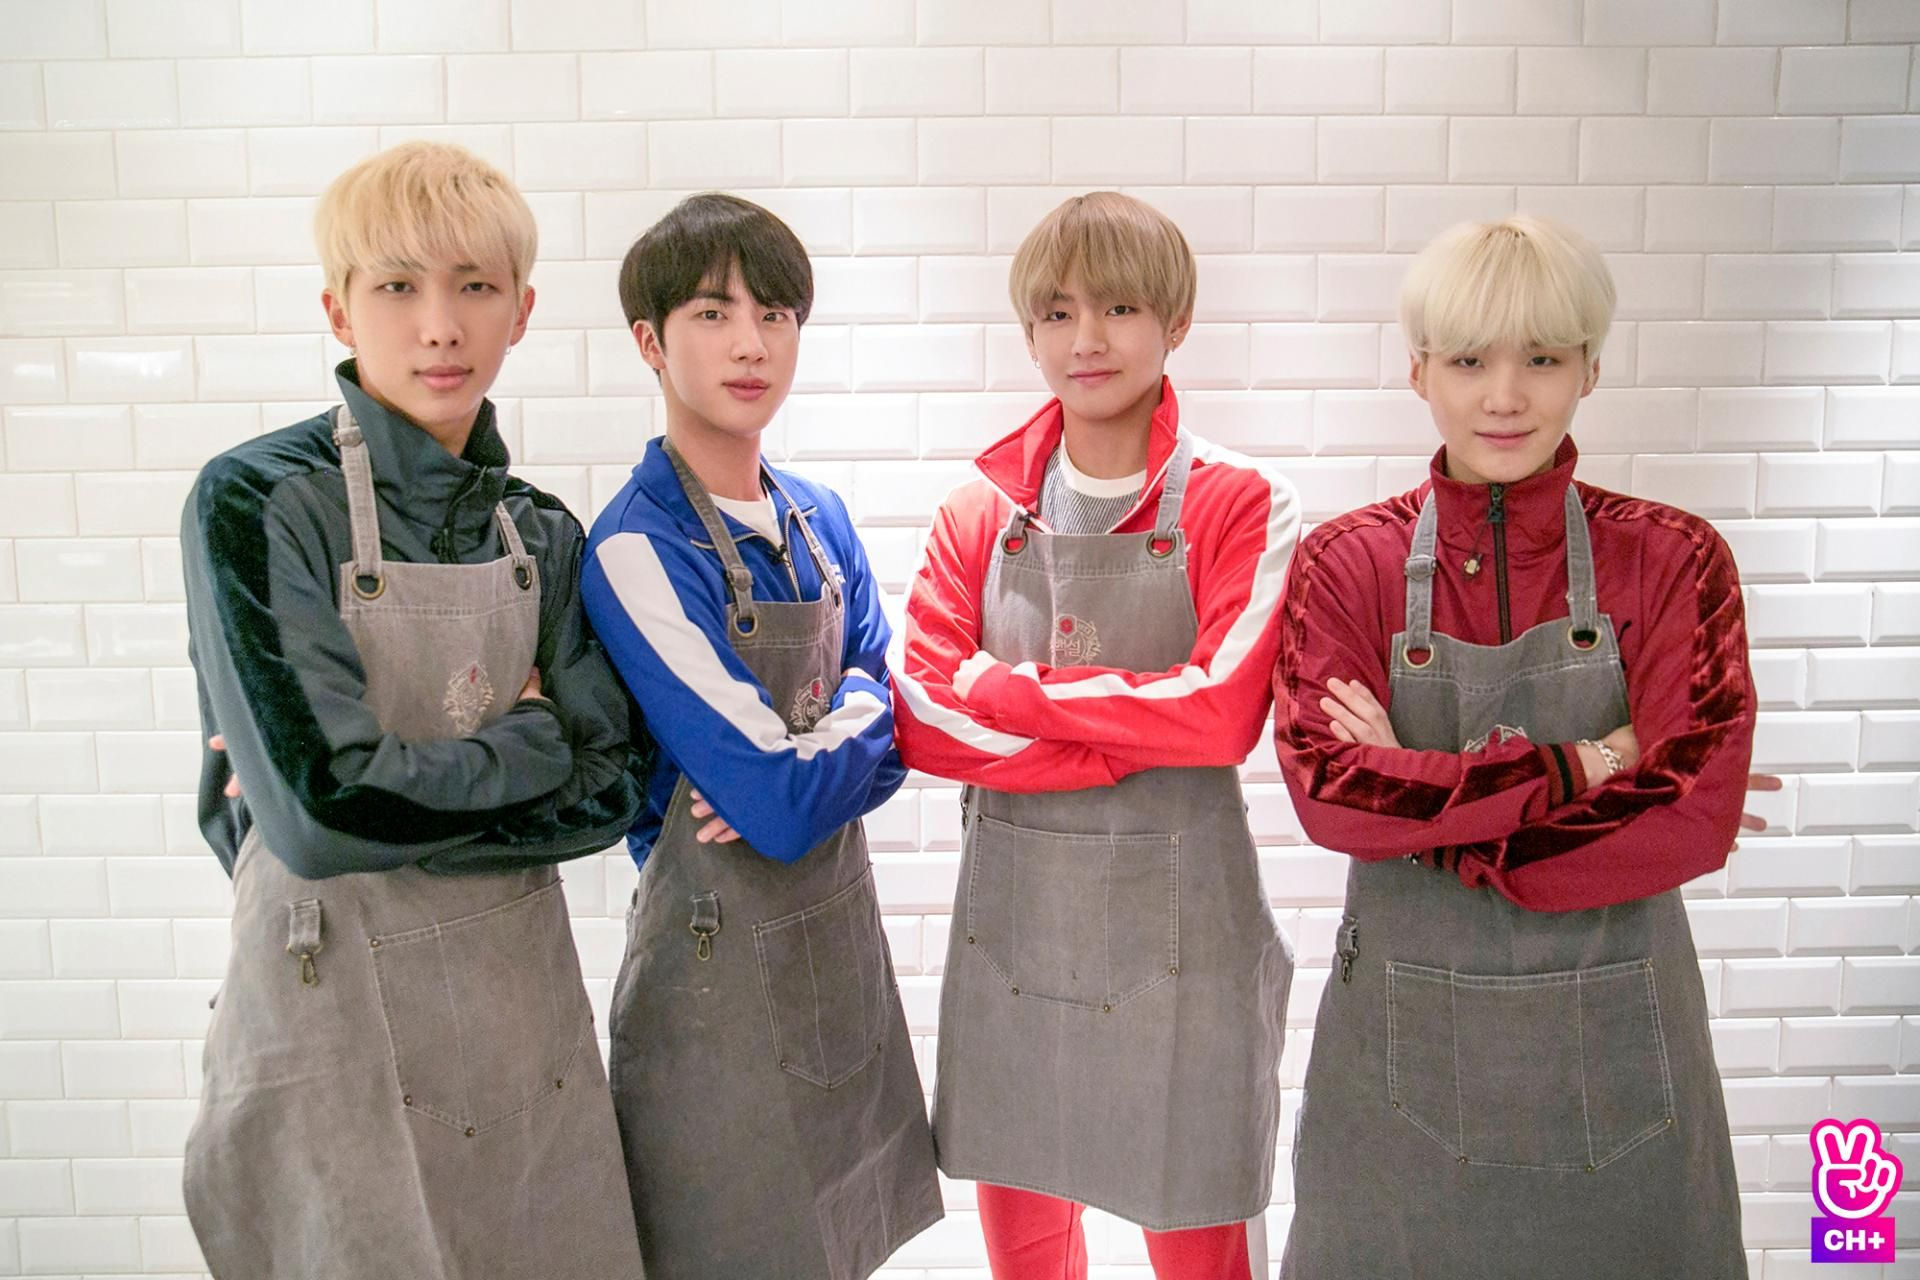 BTS || Run BTS Ep  36 || 180115 || Team Napa Cabbage Kimchi